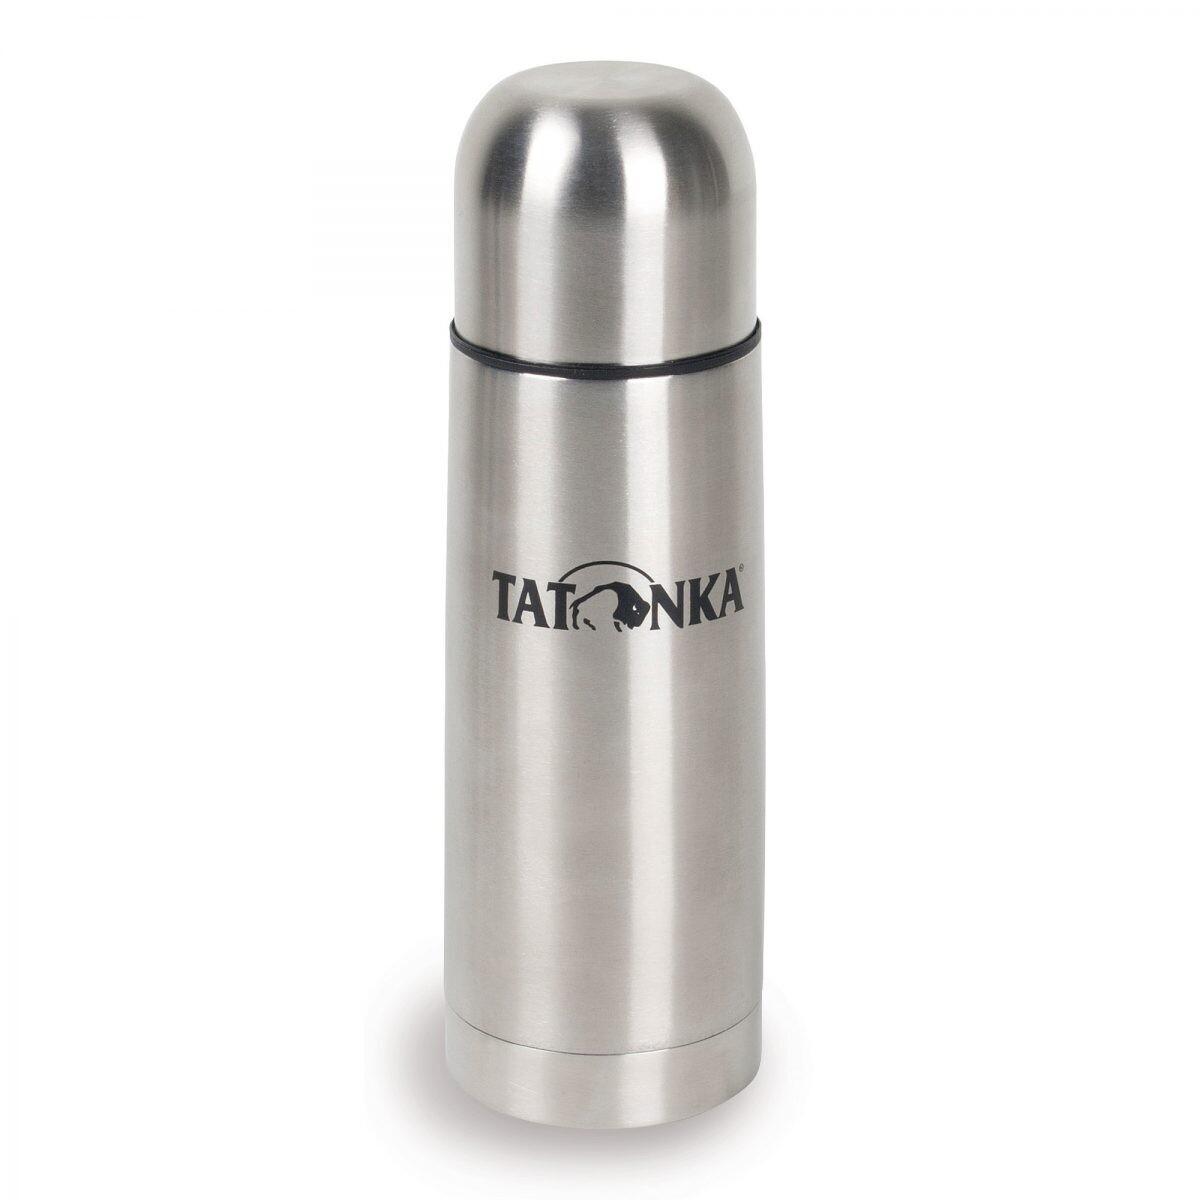 TATONKA Hot & Cold Stuff 0.35 Liter